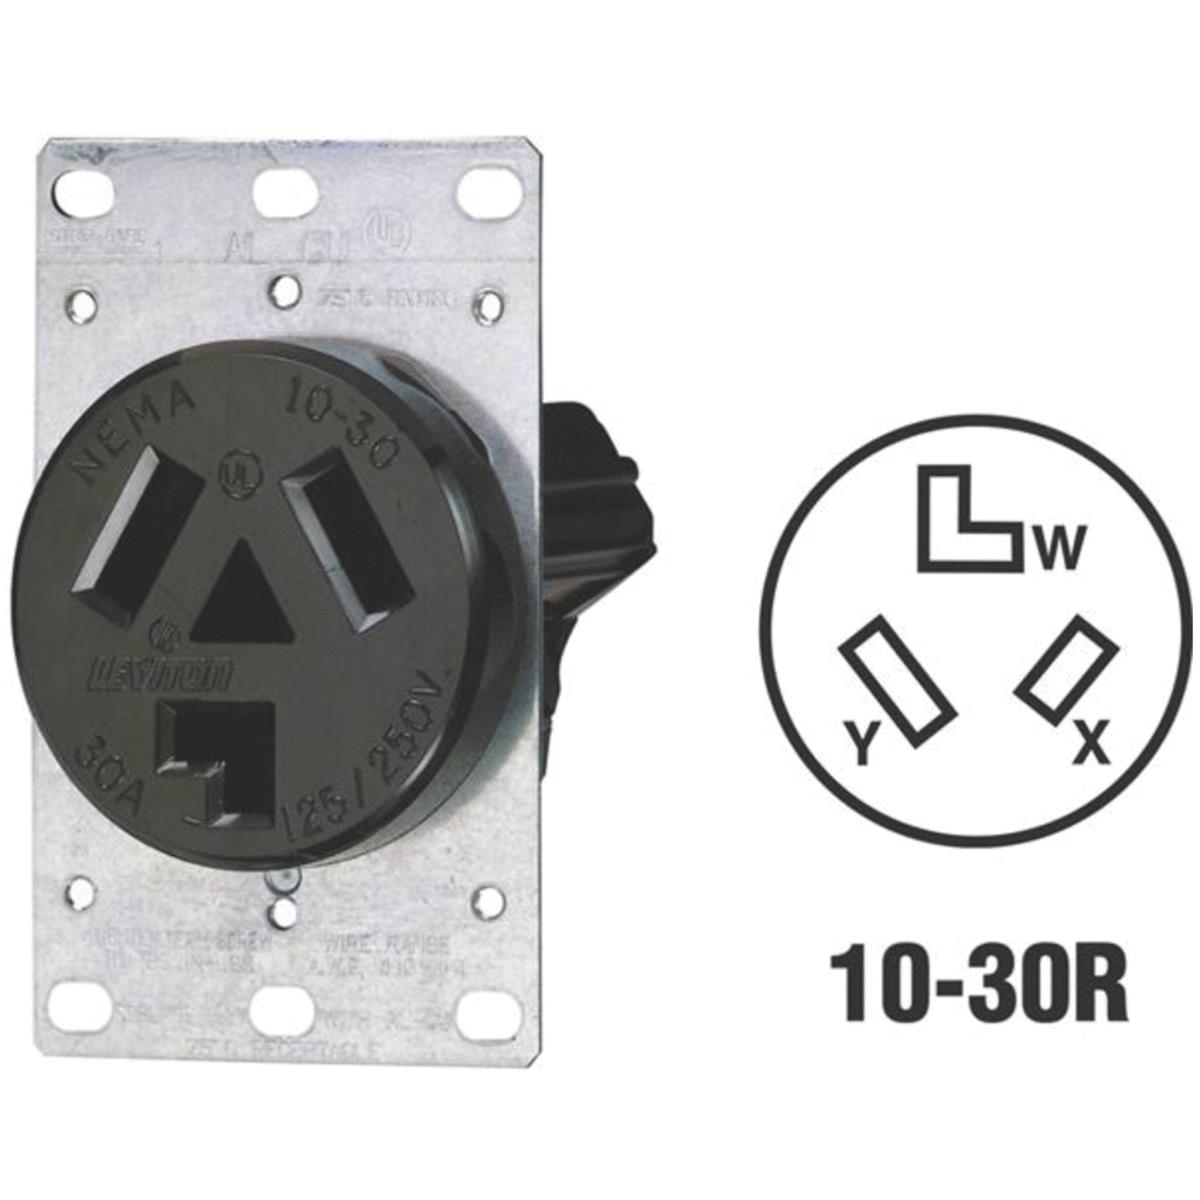 [SCHEMATICS_49CH]  CF_3751] Leviton Dryer Receptacle Wiring Diagram | Leviton Wire Diagram |  | Peted Redne Animo Isra Mohammedshrine Librar Wiring 101